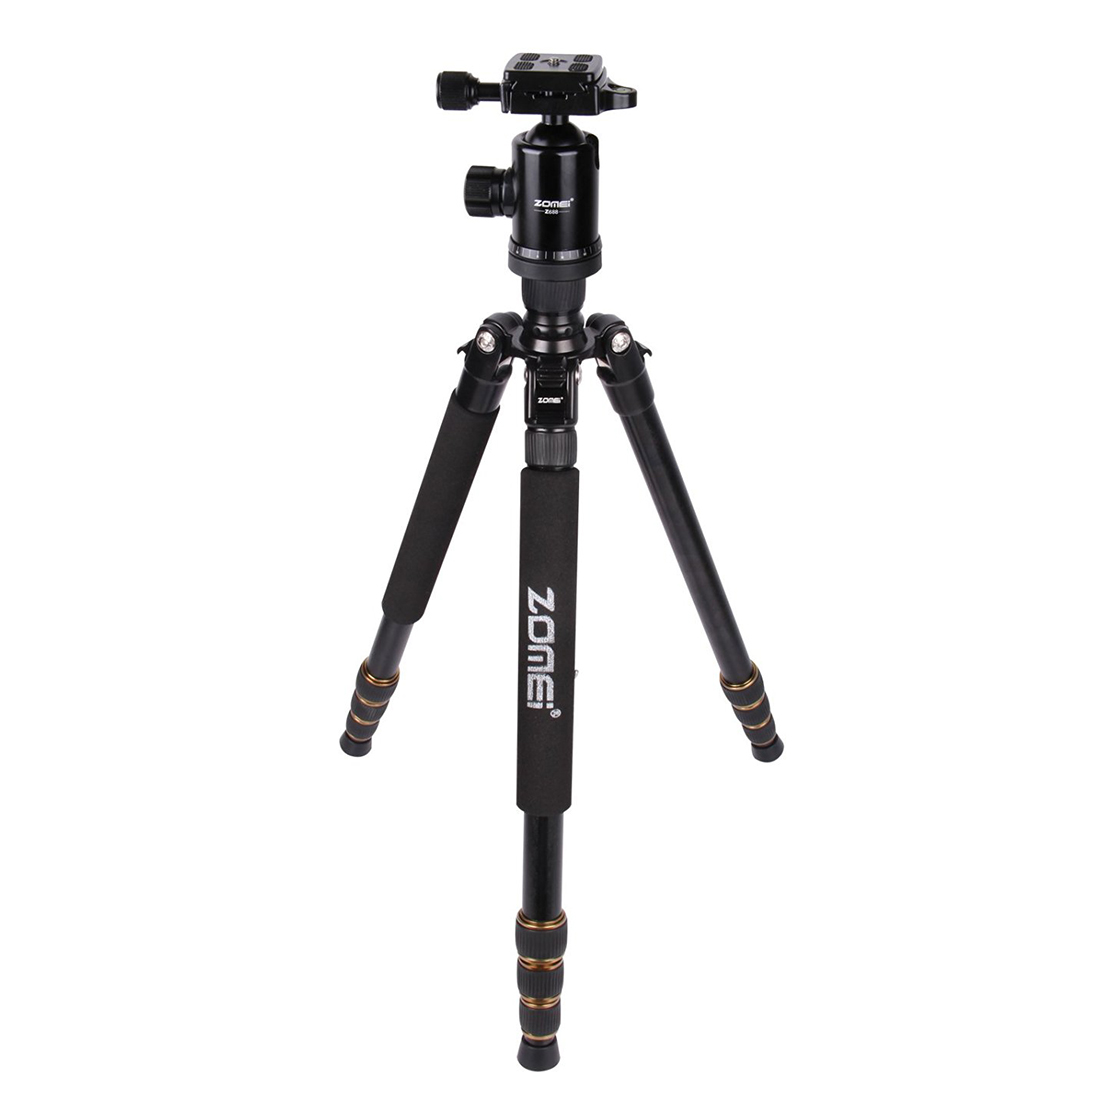 MAHA Hot ZOMEI Z688 Tripod Magnesium Alloy Monopod with Ball Head for SLR DSLR Digital Camera